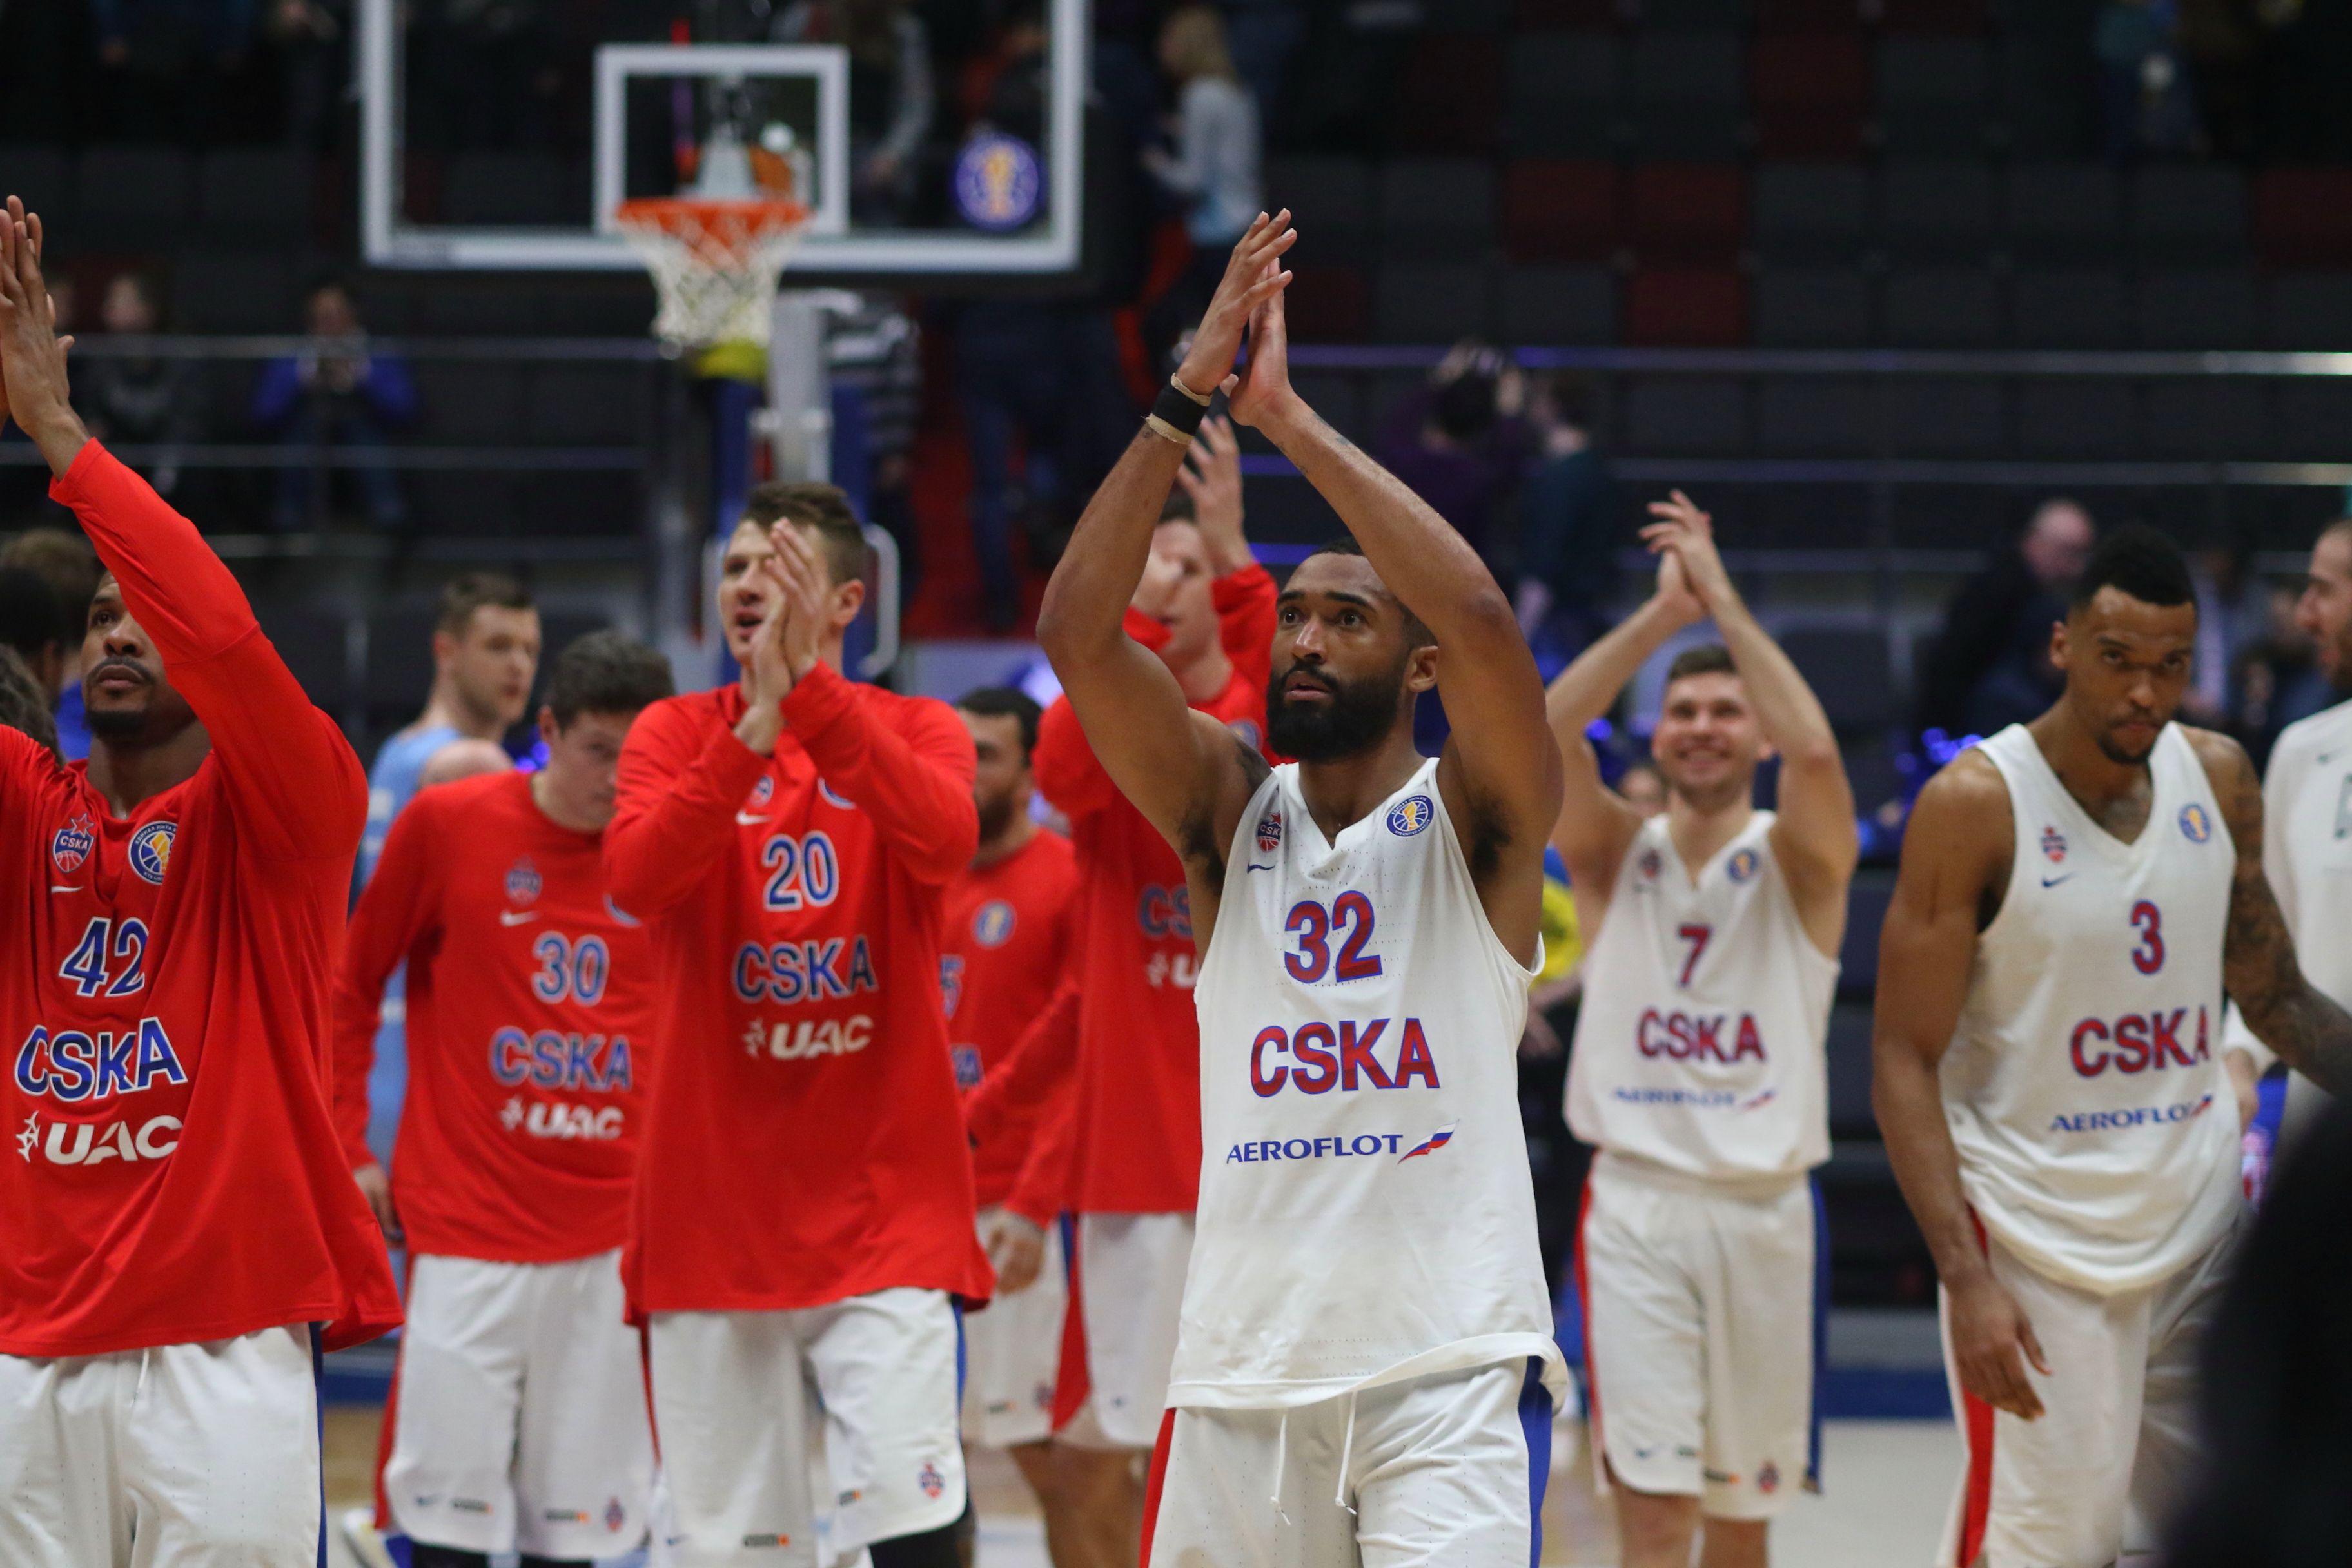 Баскетбол, Евролига, Химки - ЦСКА, прямая текстовая онлайн трансляция